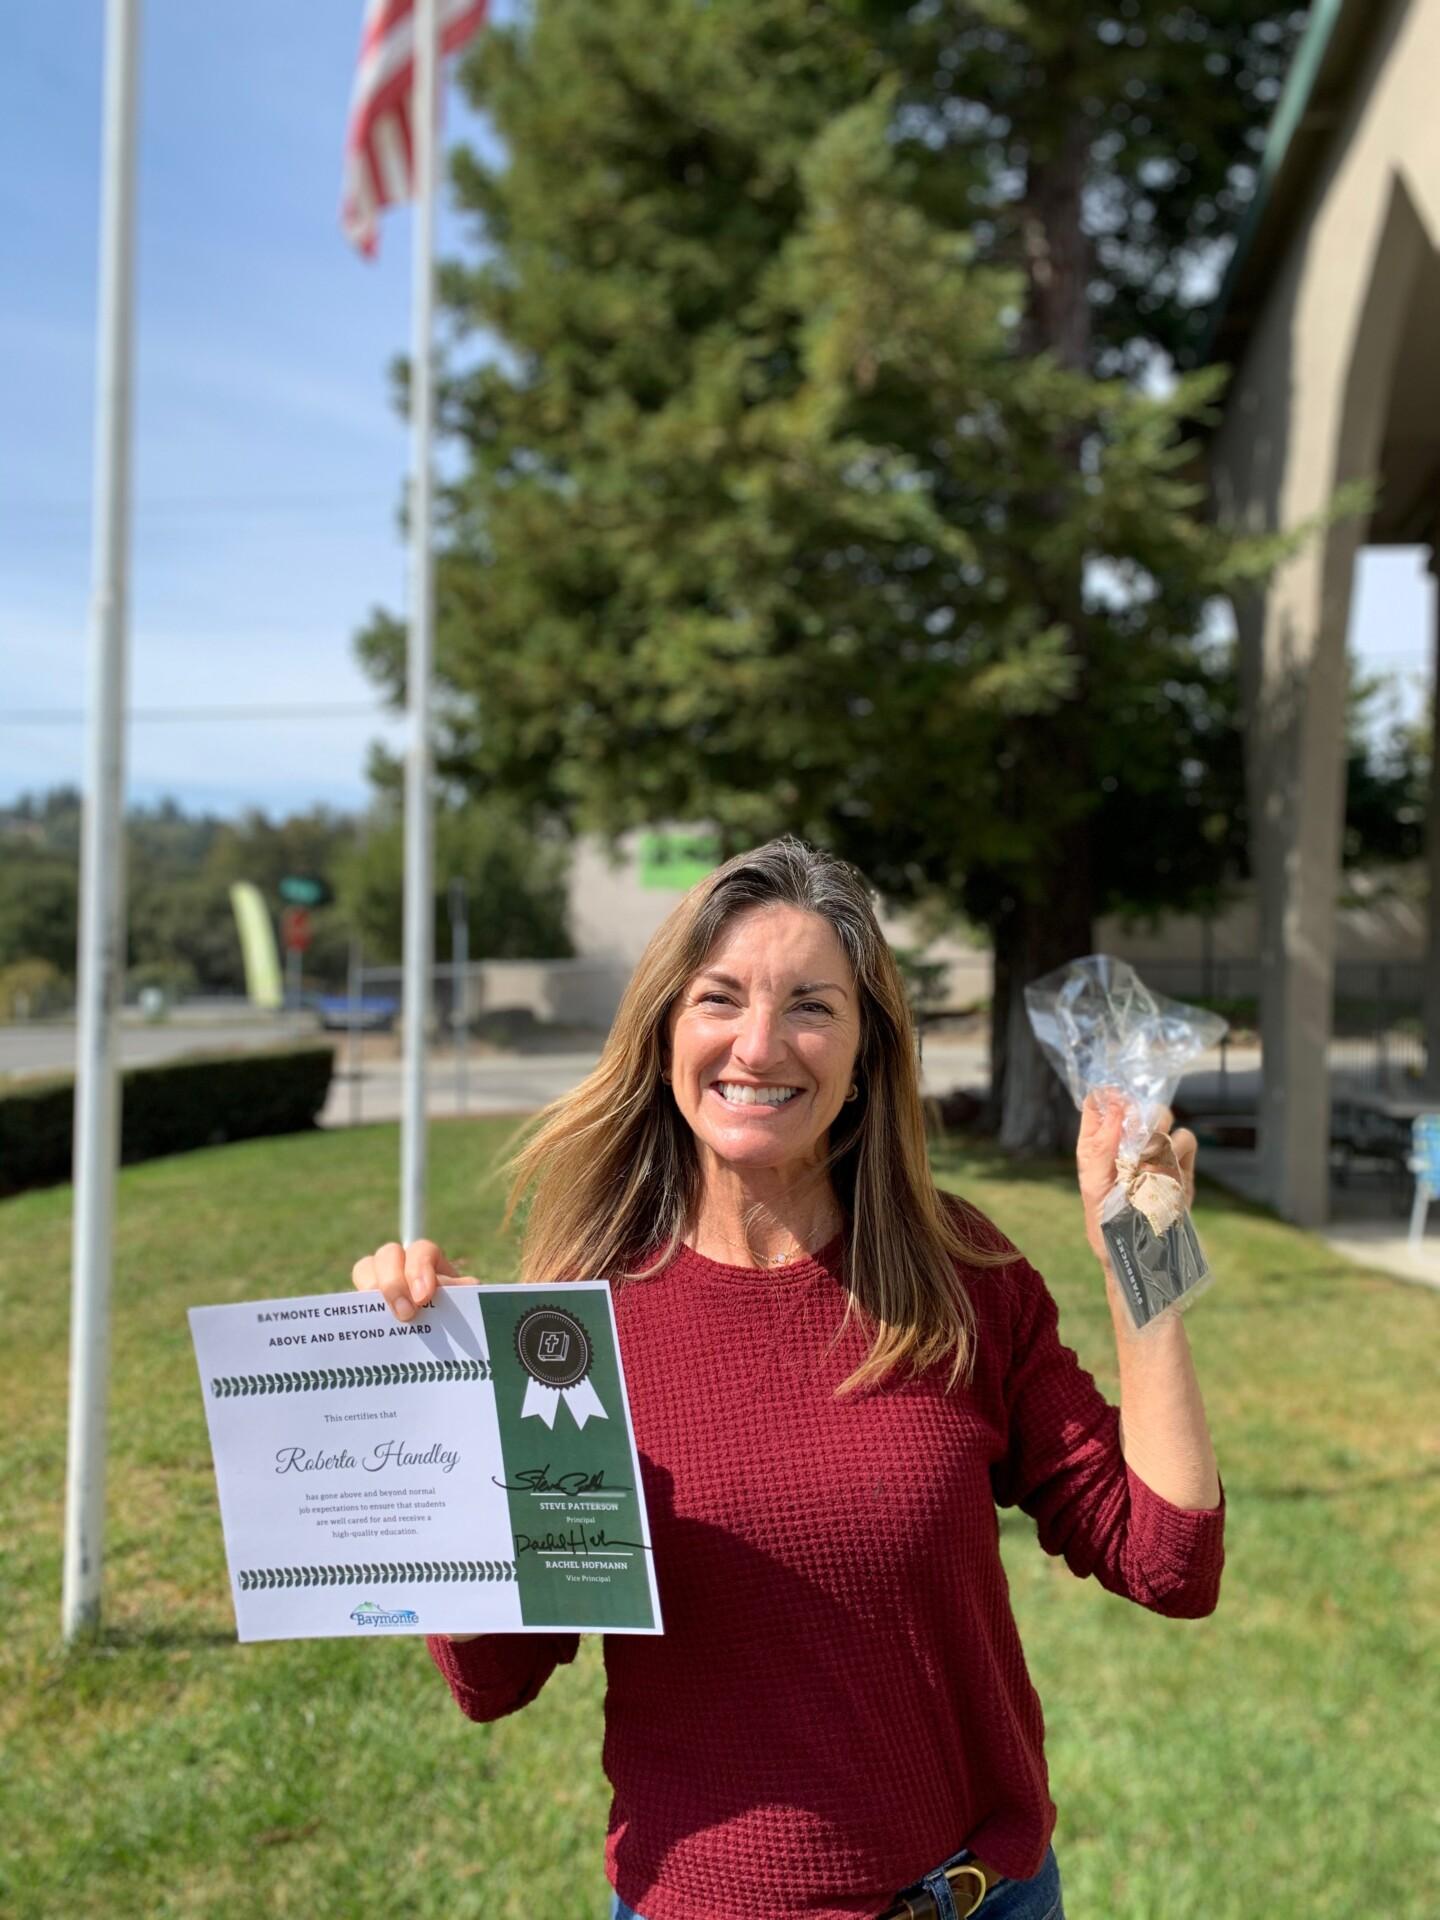 Above and Beyond Award: Roberta Handley